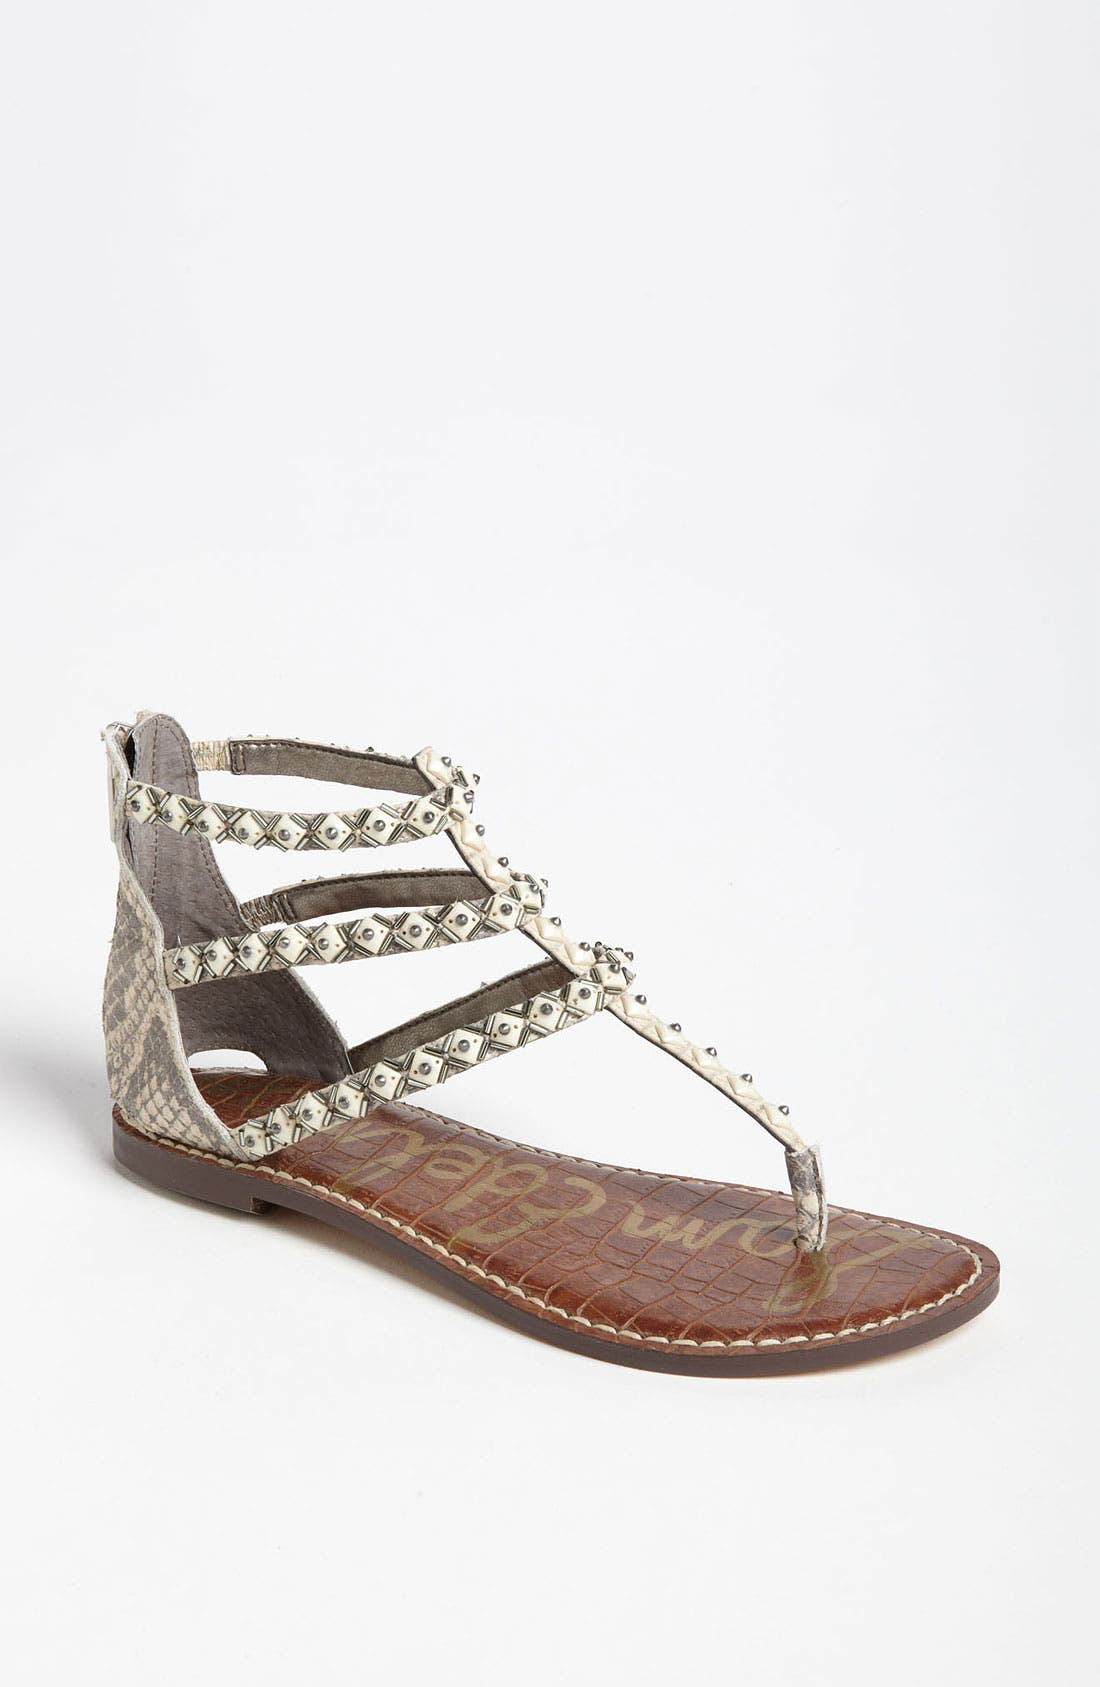 Main Image - Sam Edelman 'Greyson' Sandal